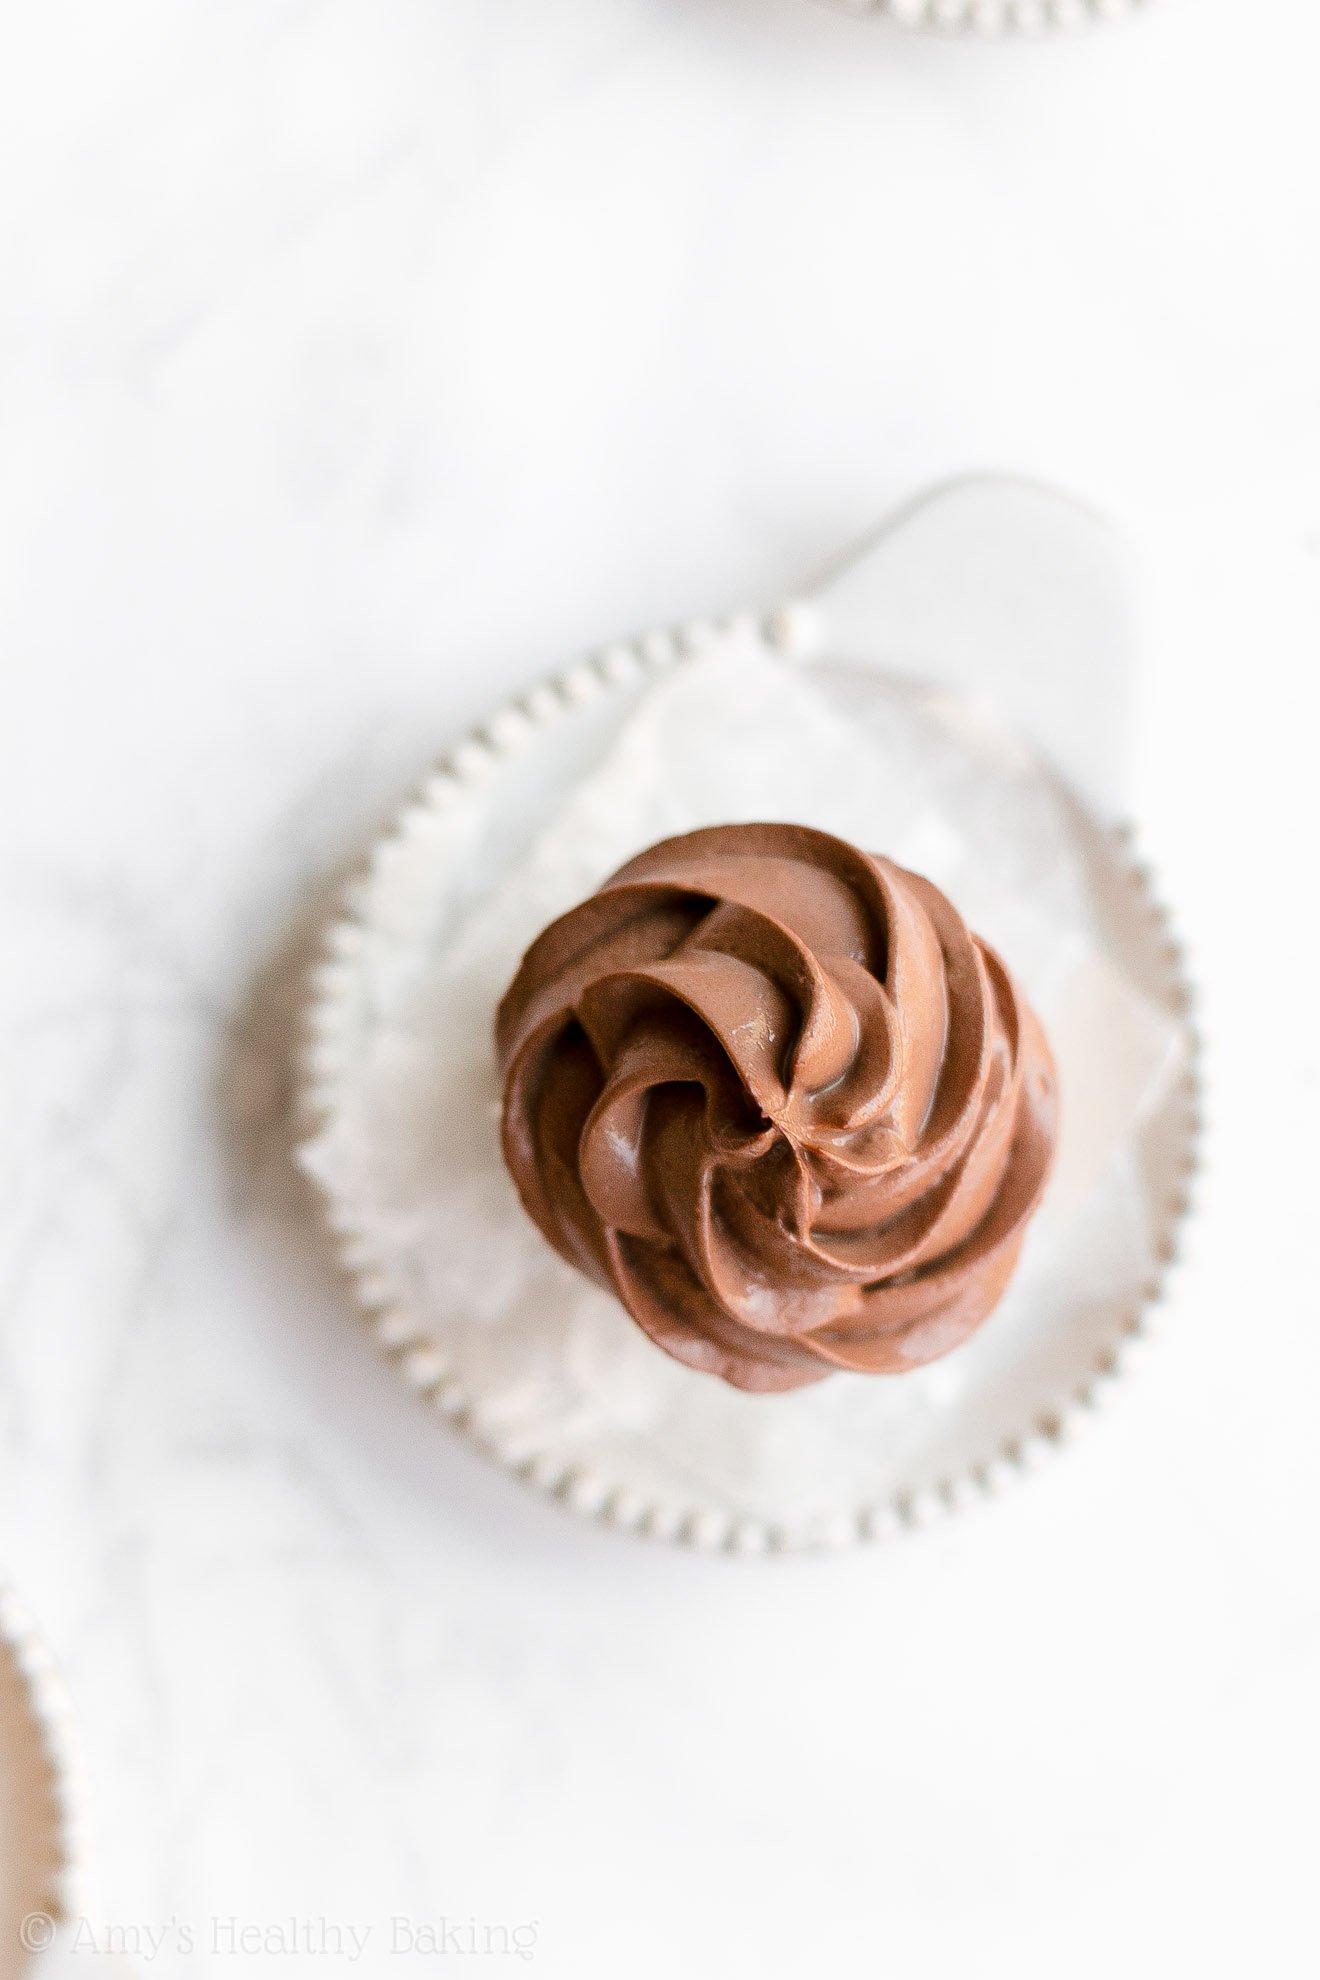 Easy Healthy Mini Pumpkin Cupcakes with Sugar Free Chocolate Greek Yogurt Frosting